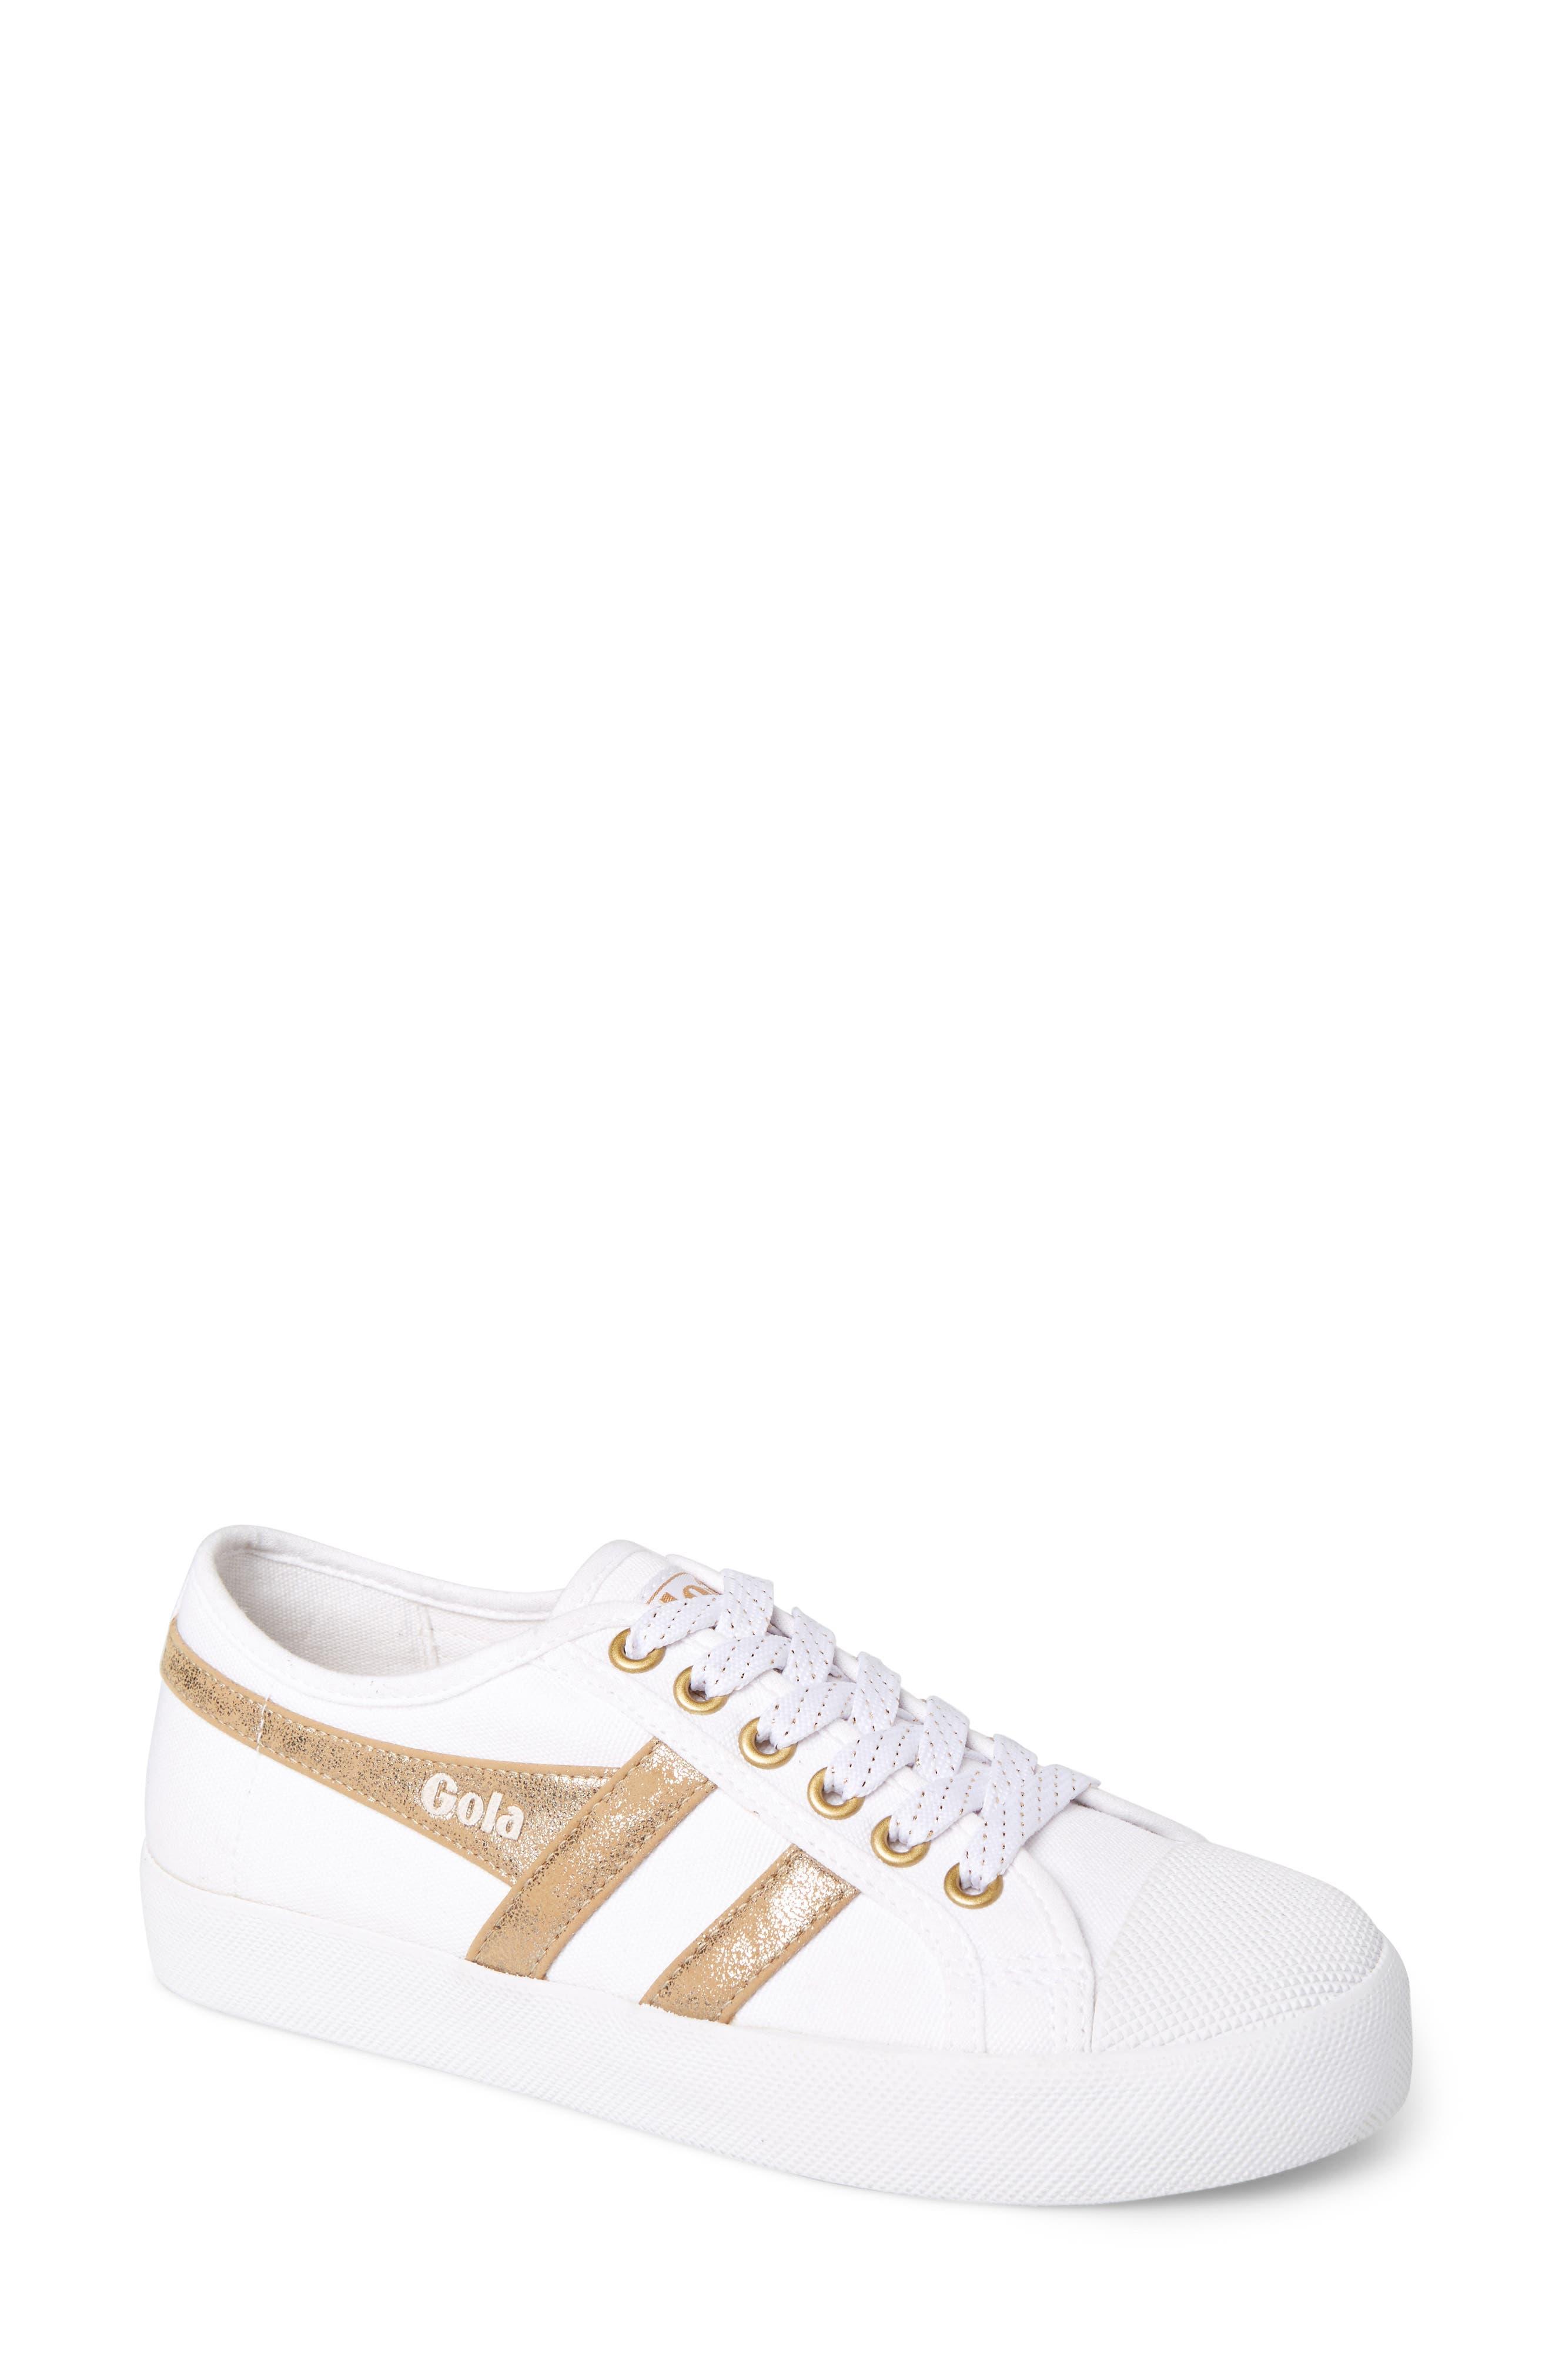 Coaster Mirror Sneaker,                             Main thumbnail 1, color,                             White/ Gold